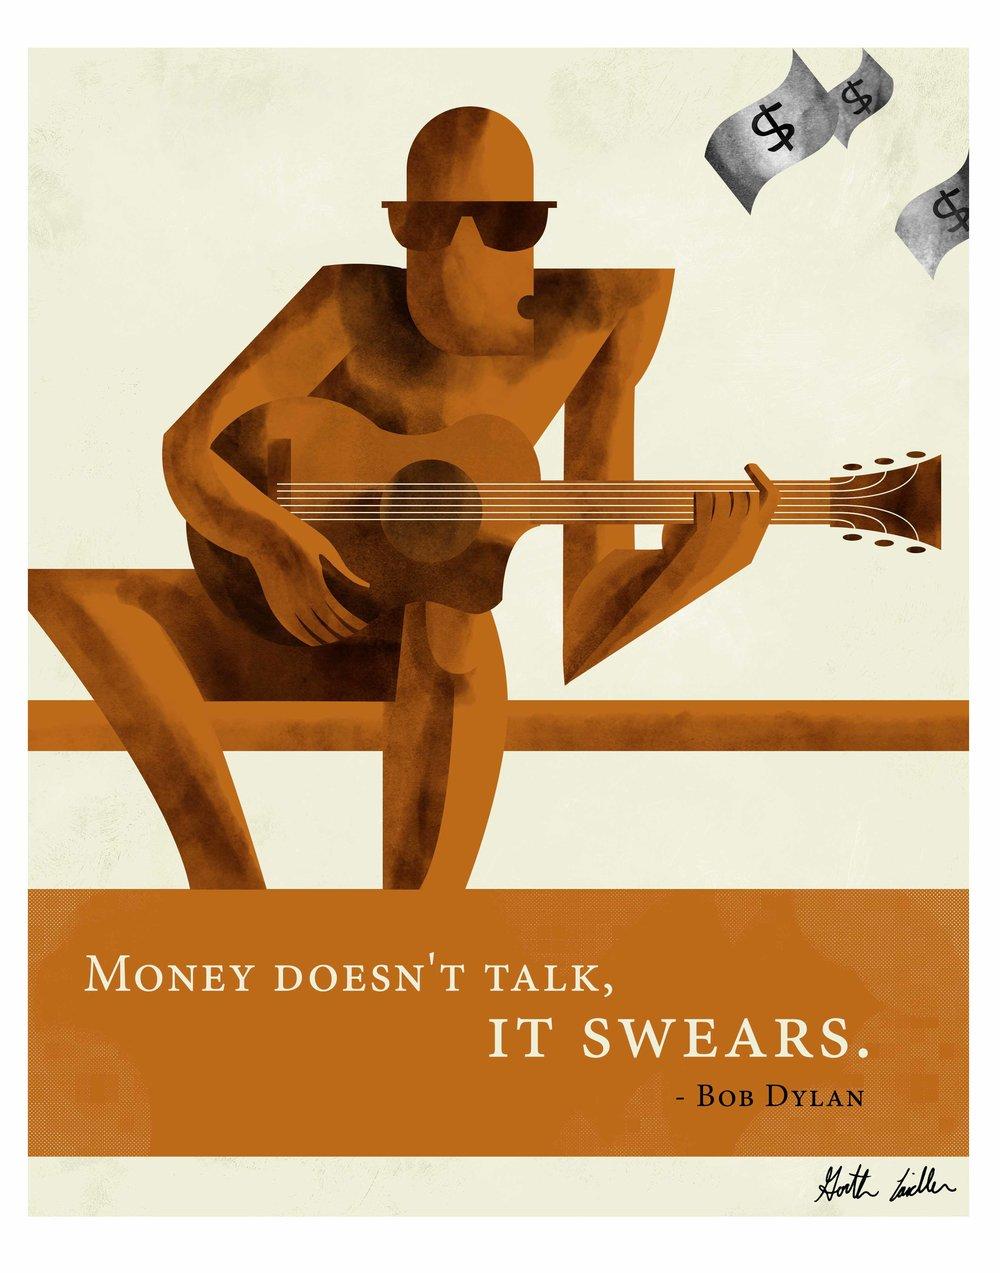 Quote Illustration - Bob Dylan